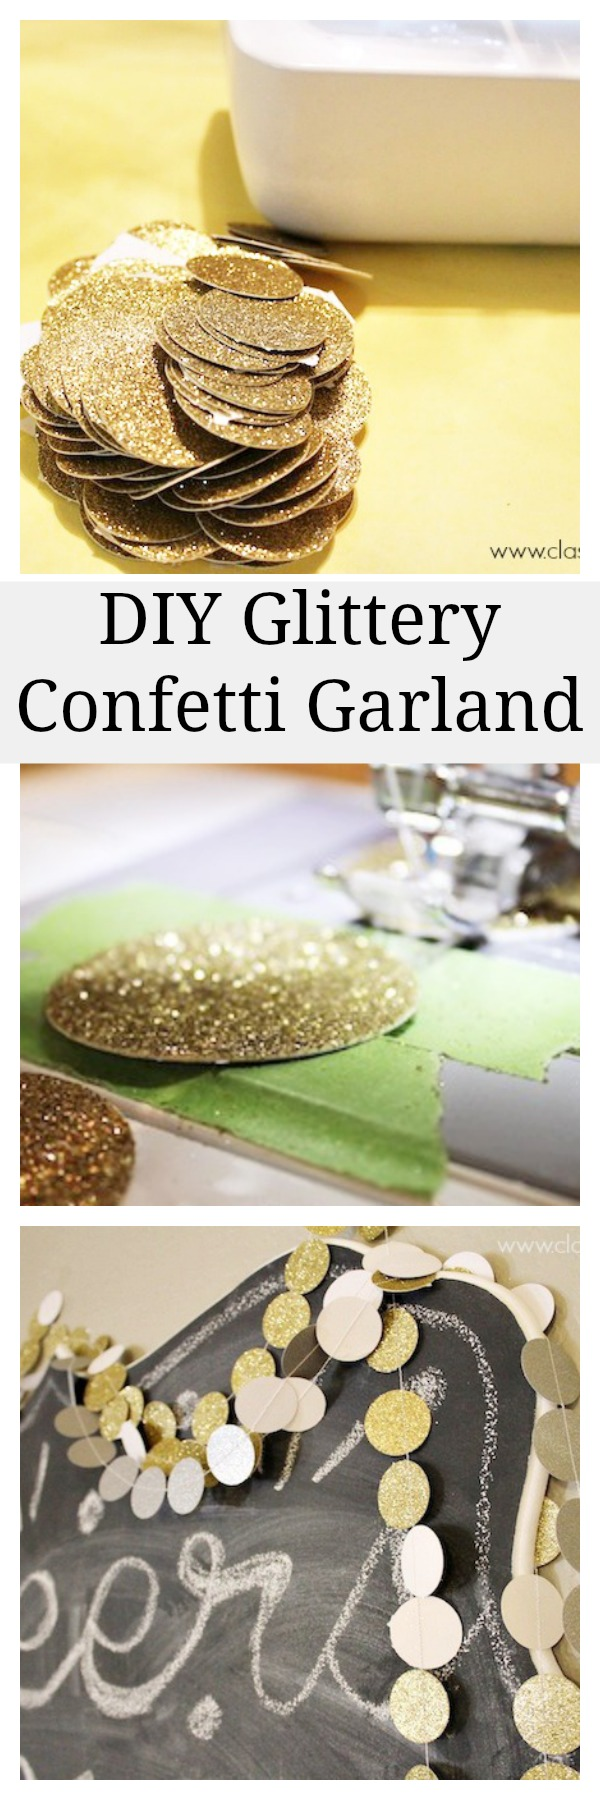 Diy Glittery Garland